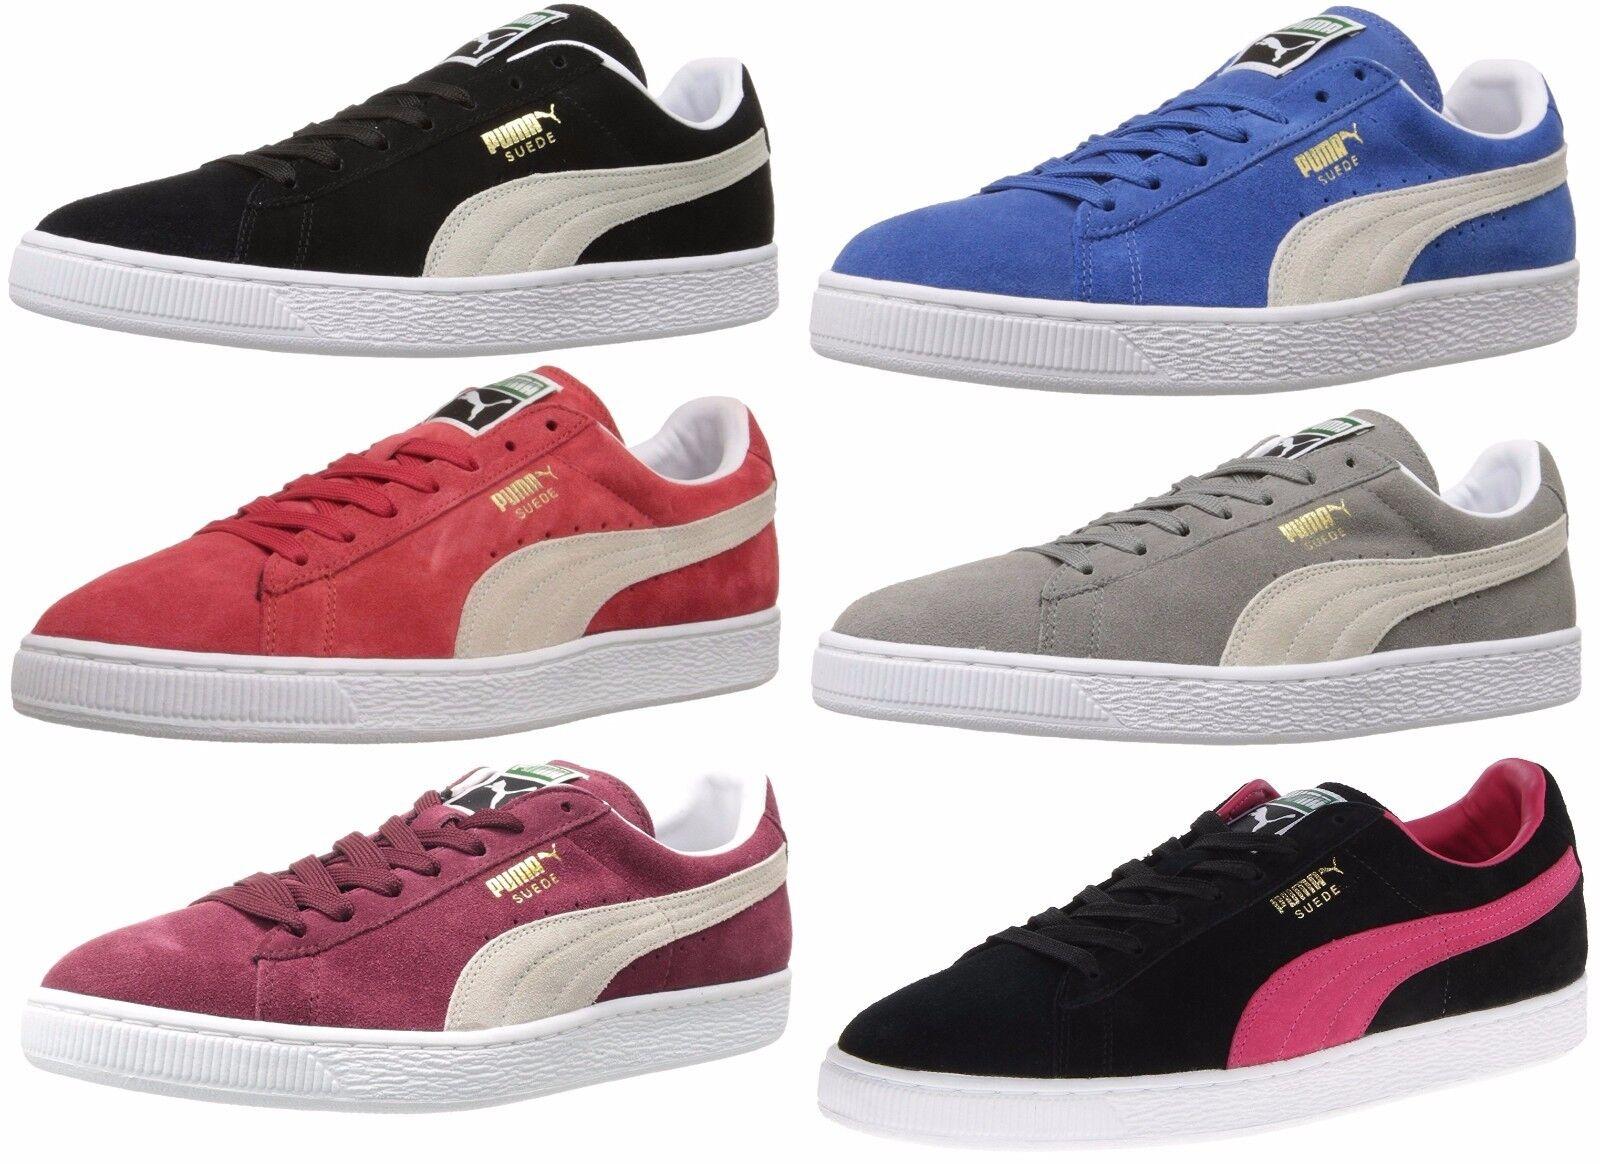 PUMA Men's Suede Classic Sneaker shoes